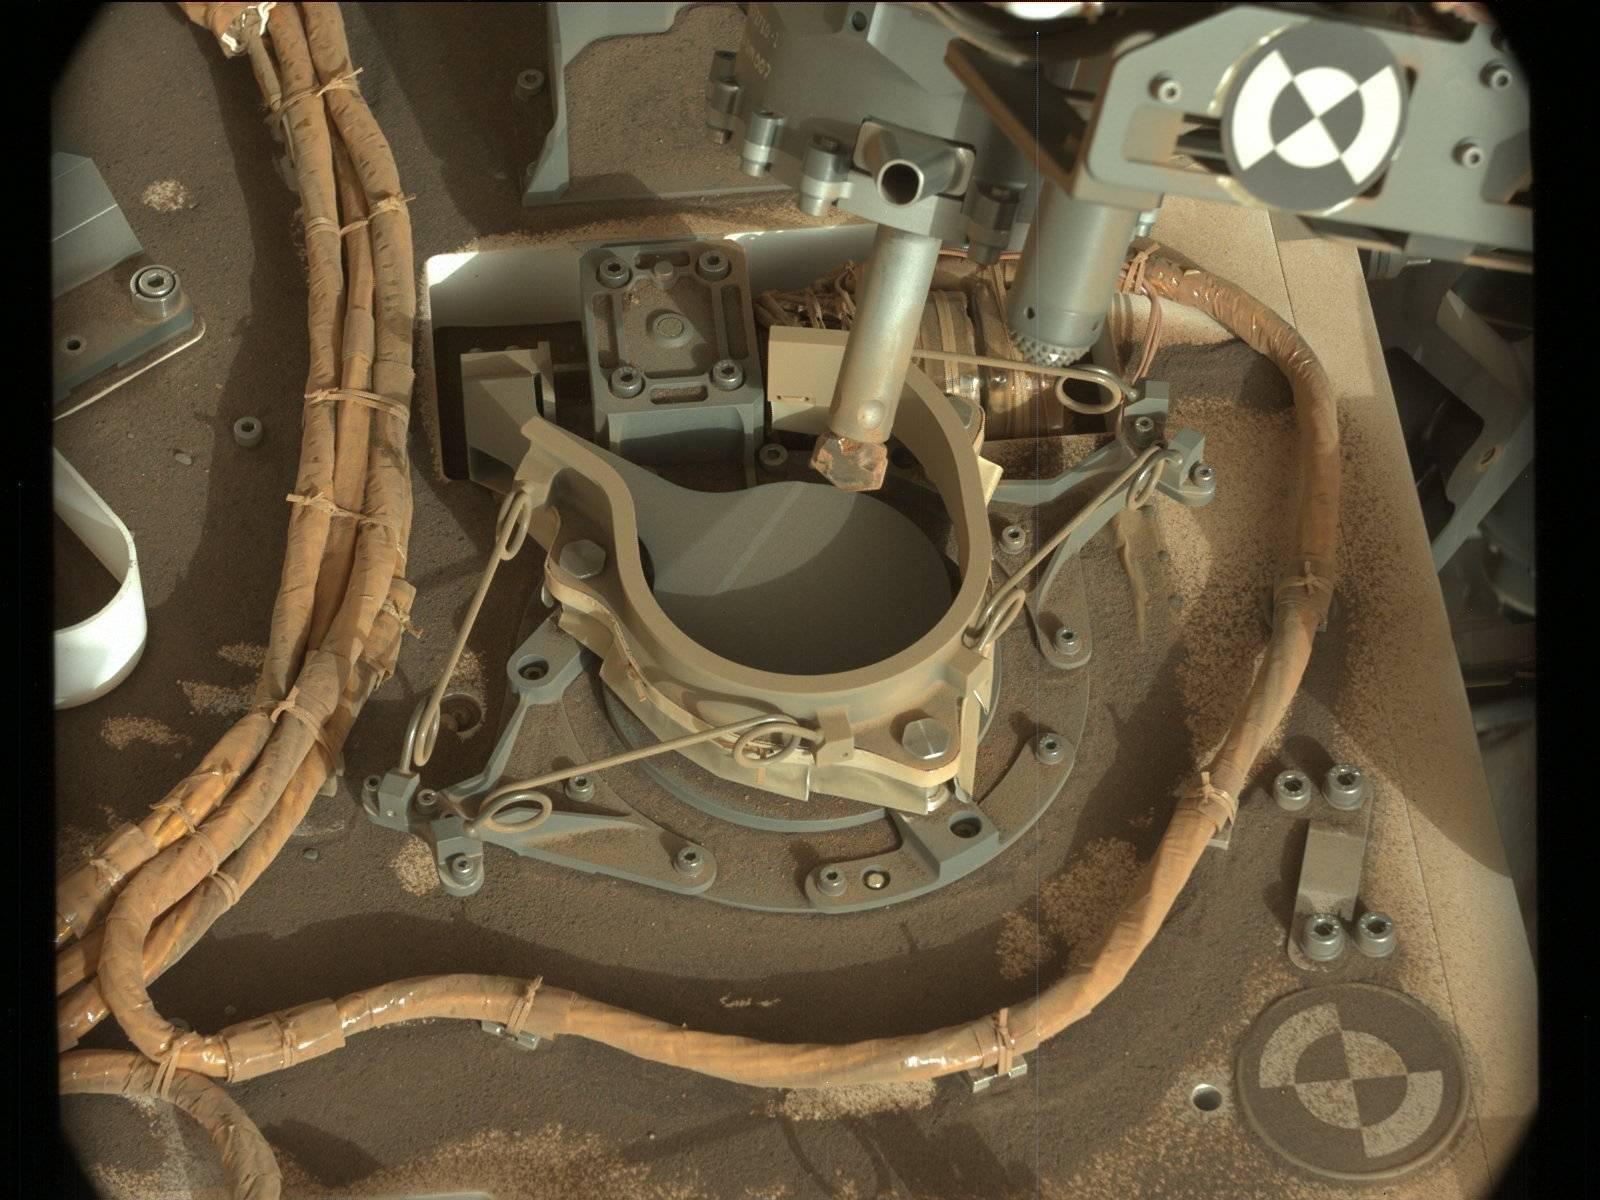 mars curiosity rover back online - photo #39